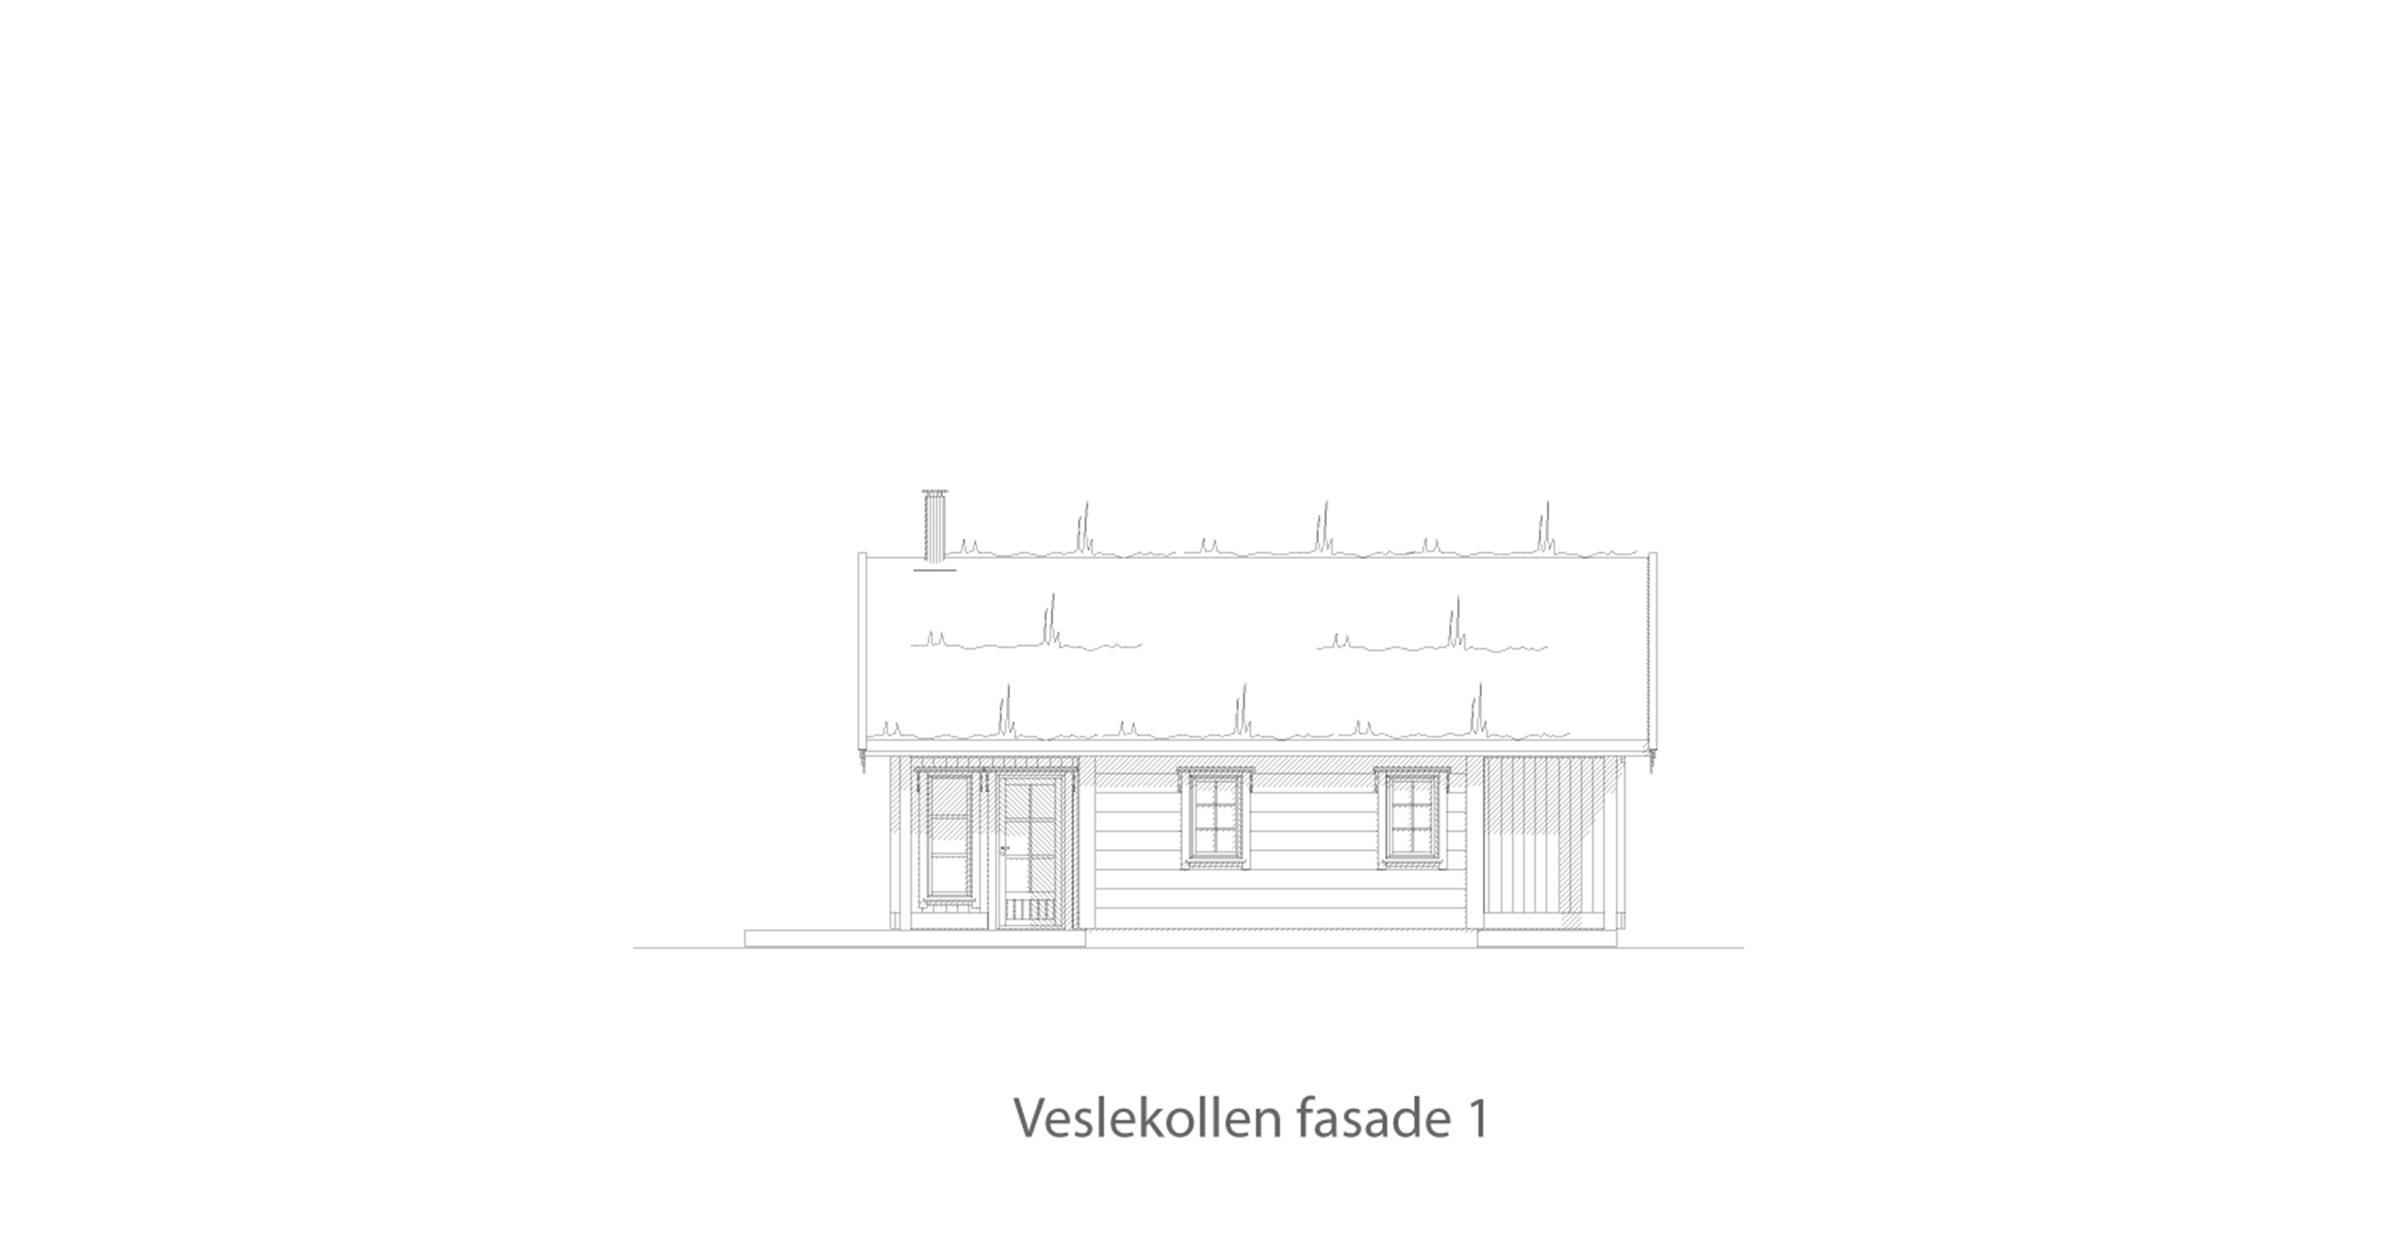 Veslekollen fasade 1